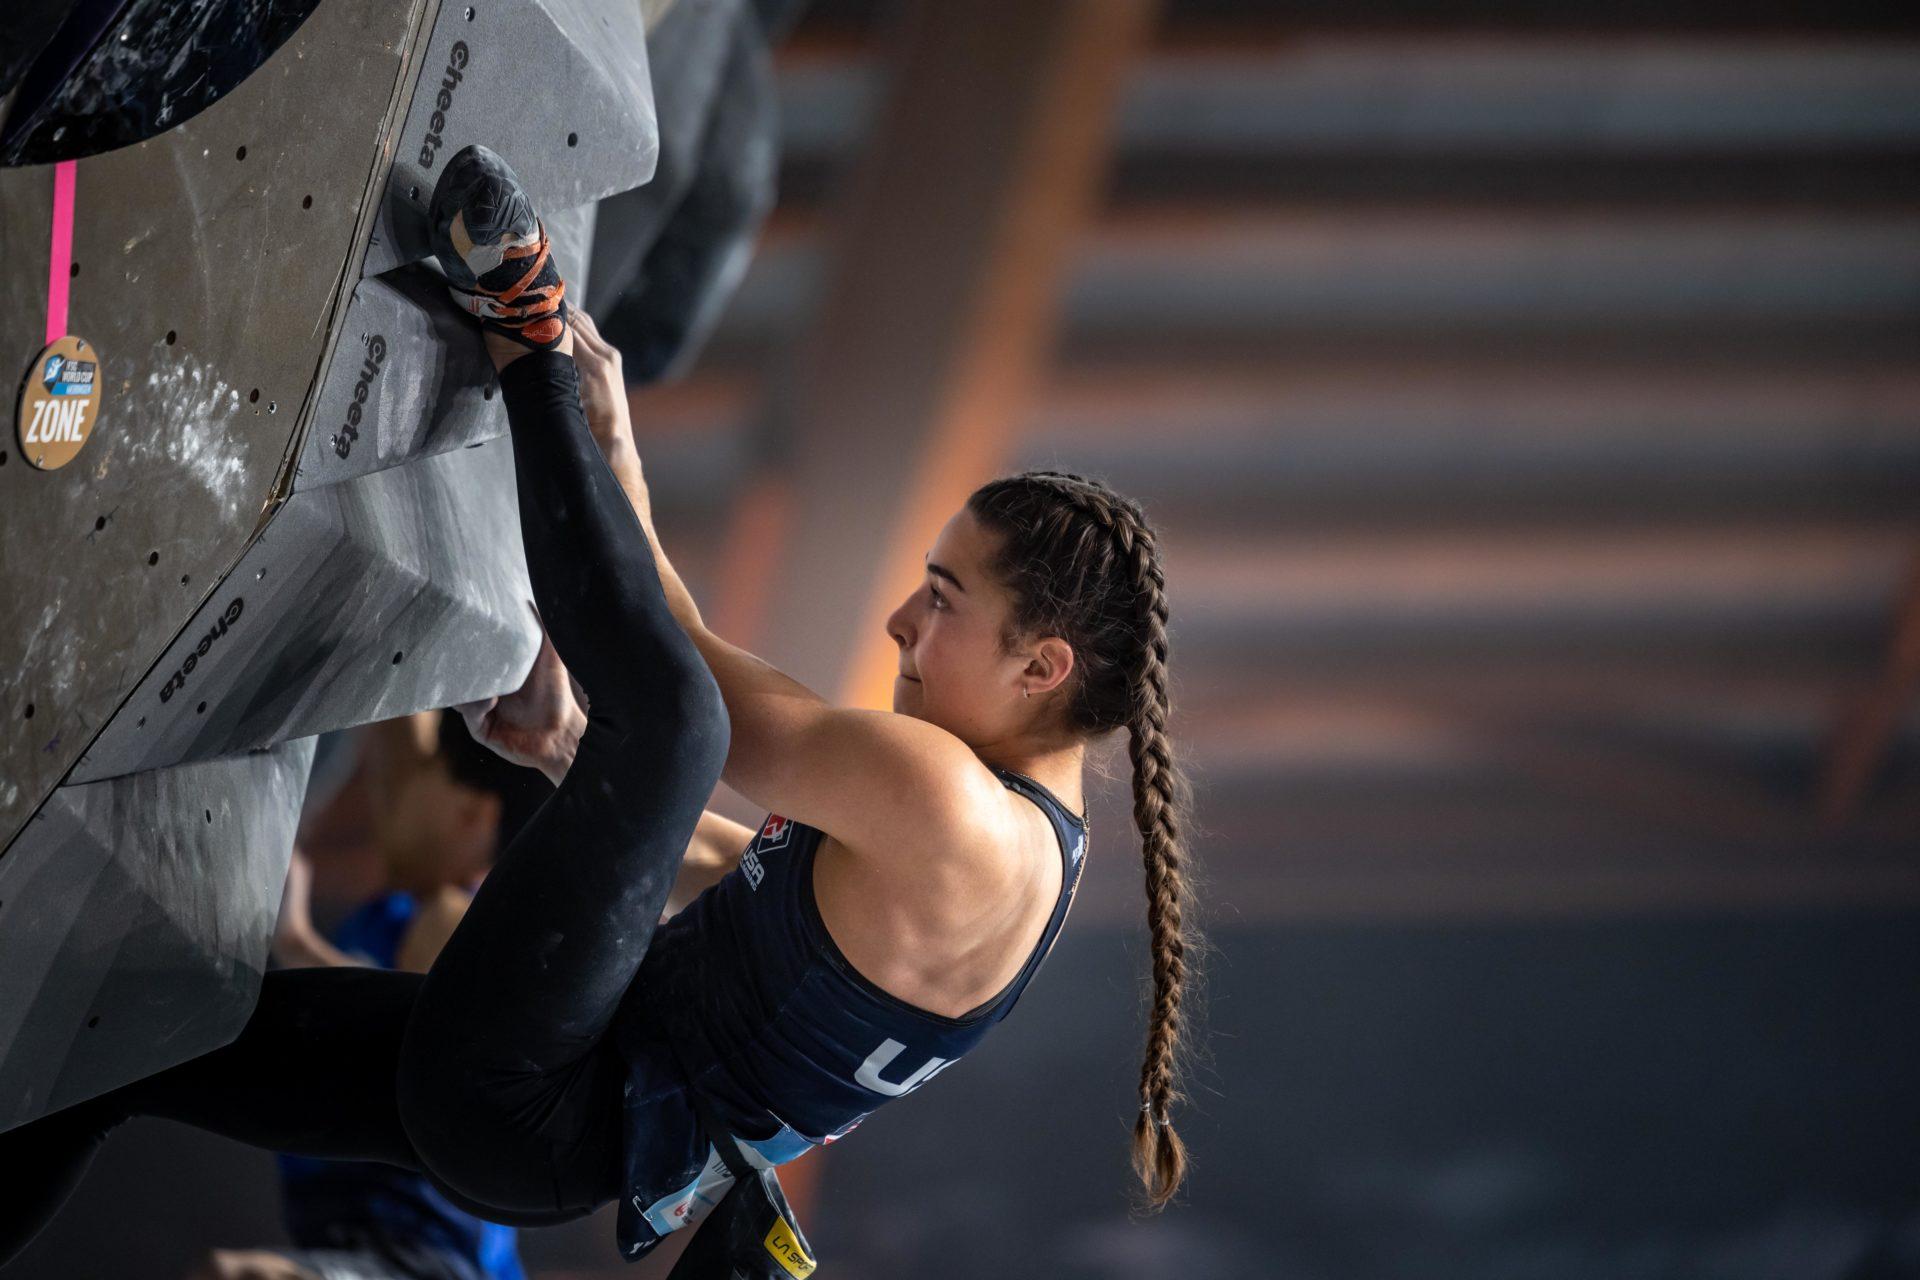 Female USA Climber on climbing wall